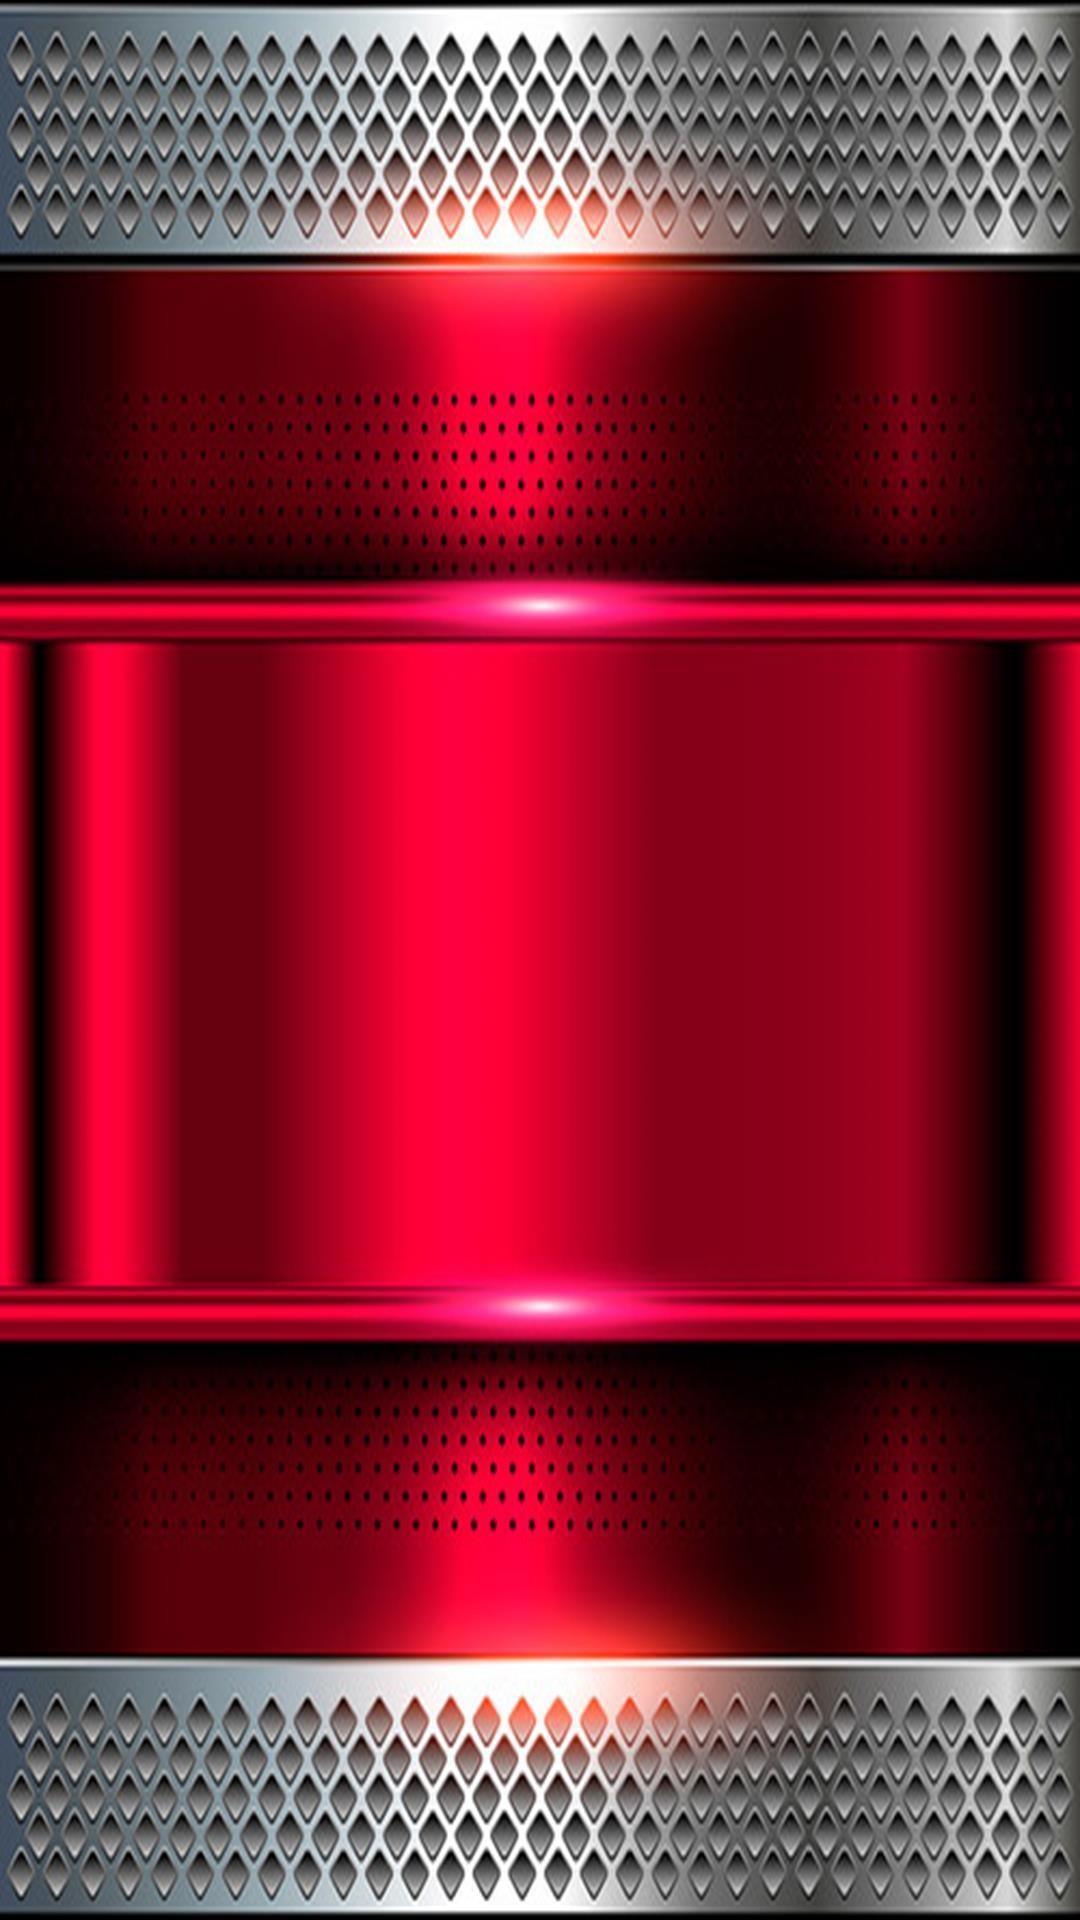 1080x1920 A Samsung Iphone Edge Phonetelefon 3d Wallpaper Shiny Metallic Red Chrome 1080x1920 Wallpaper Teahub Io